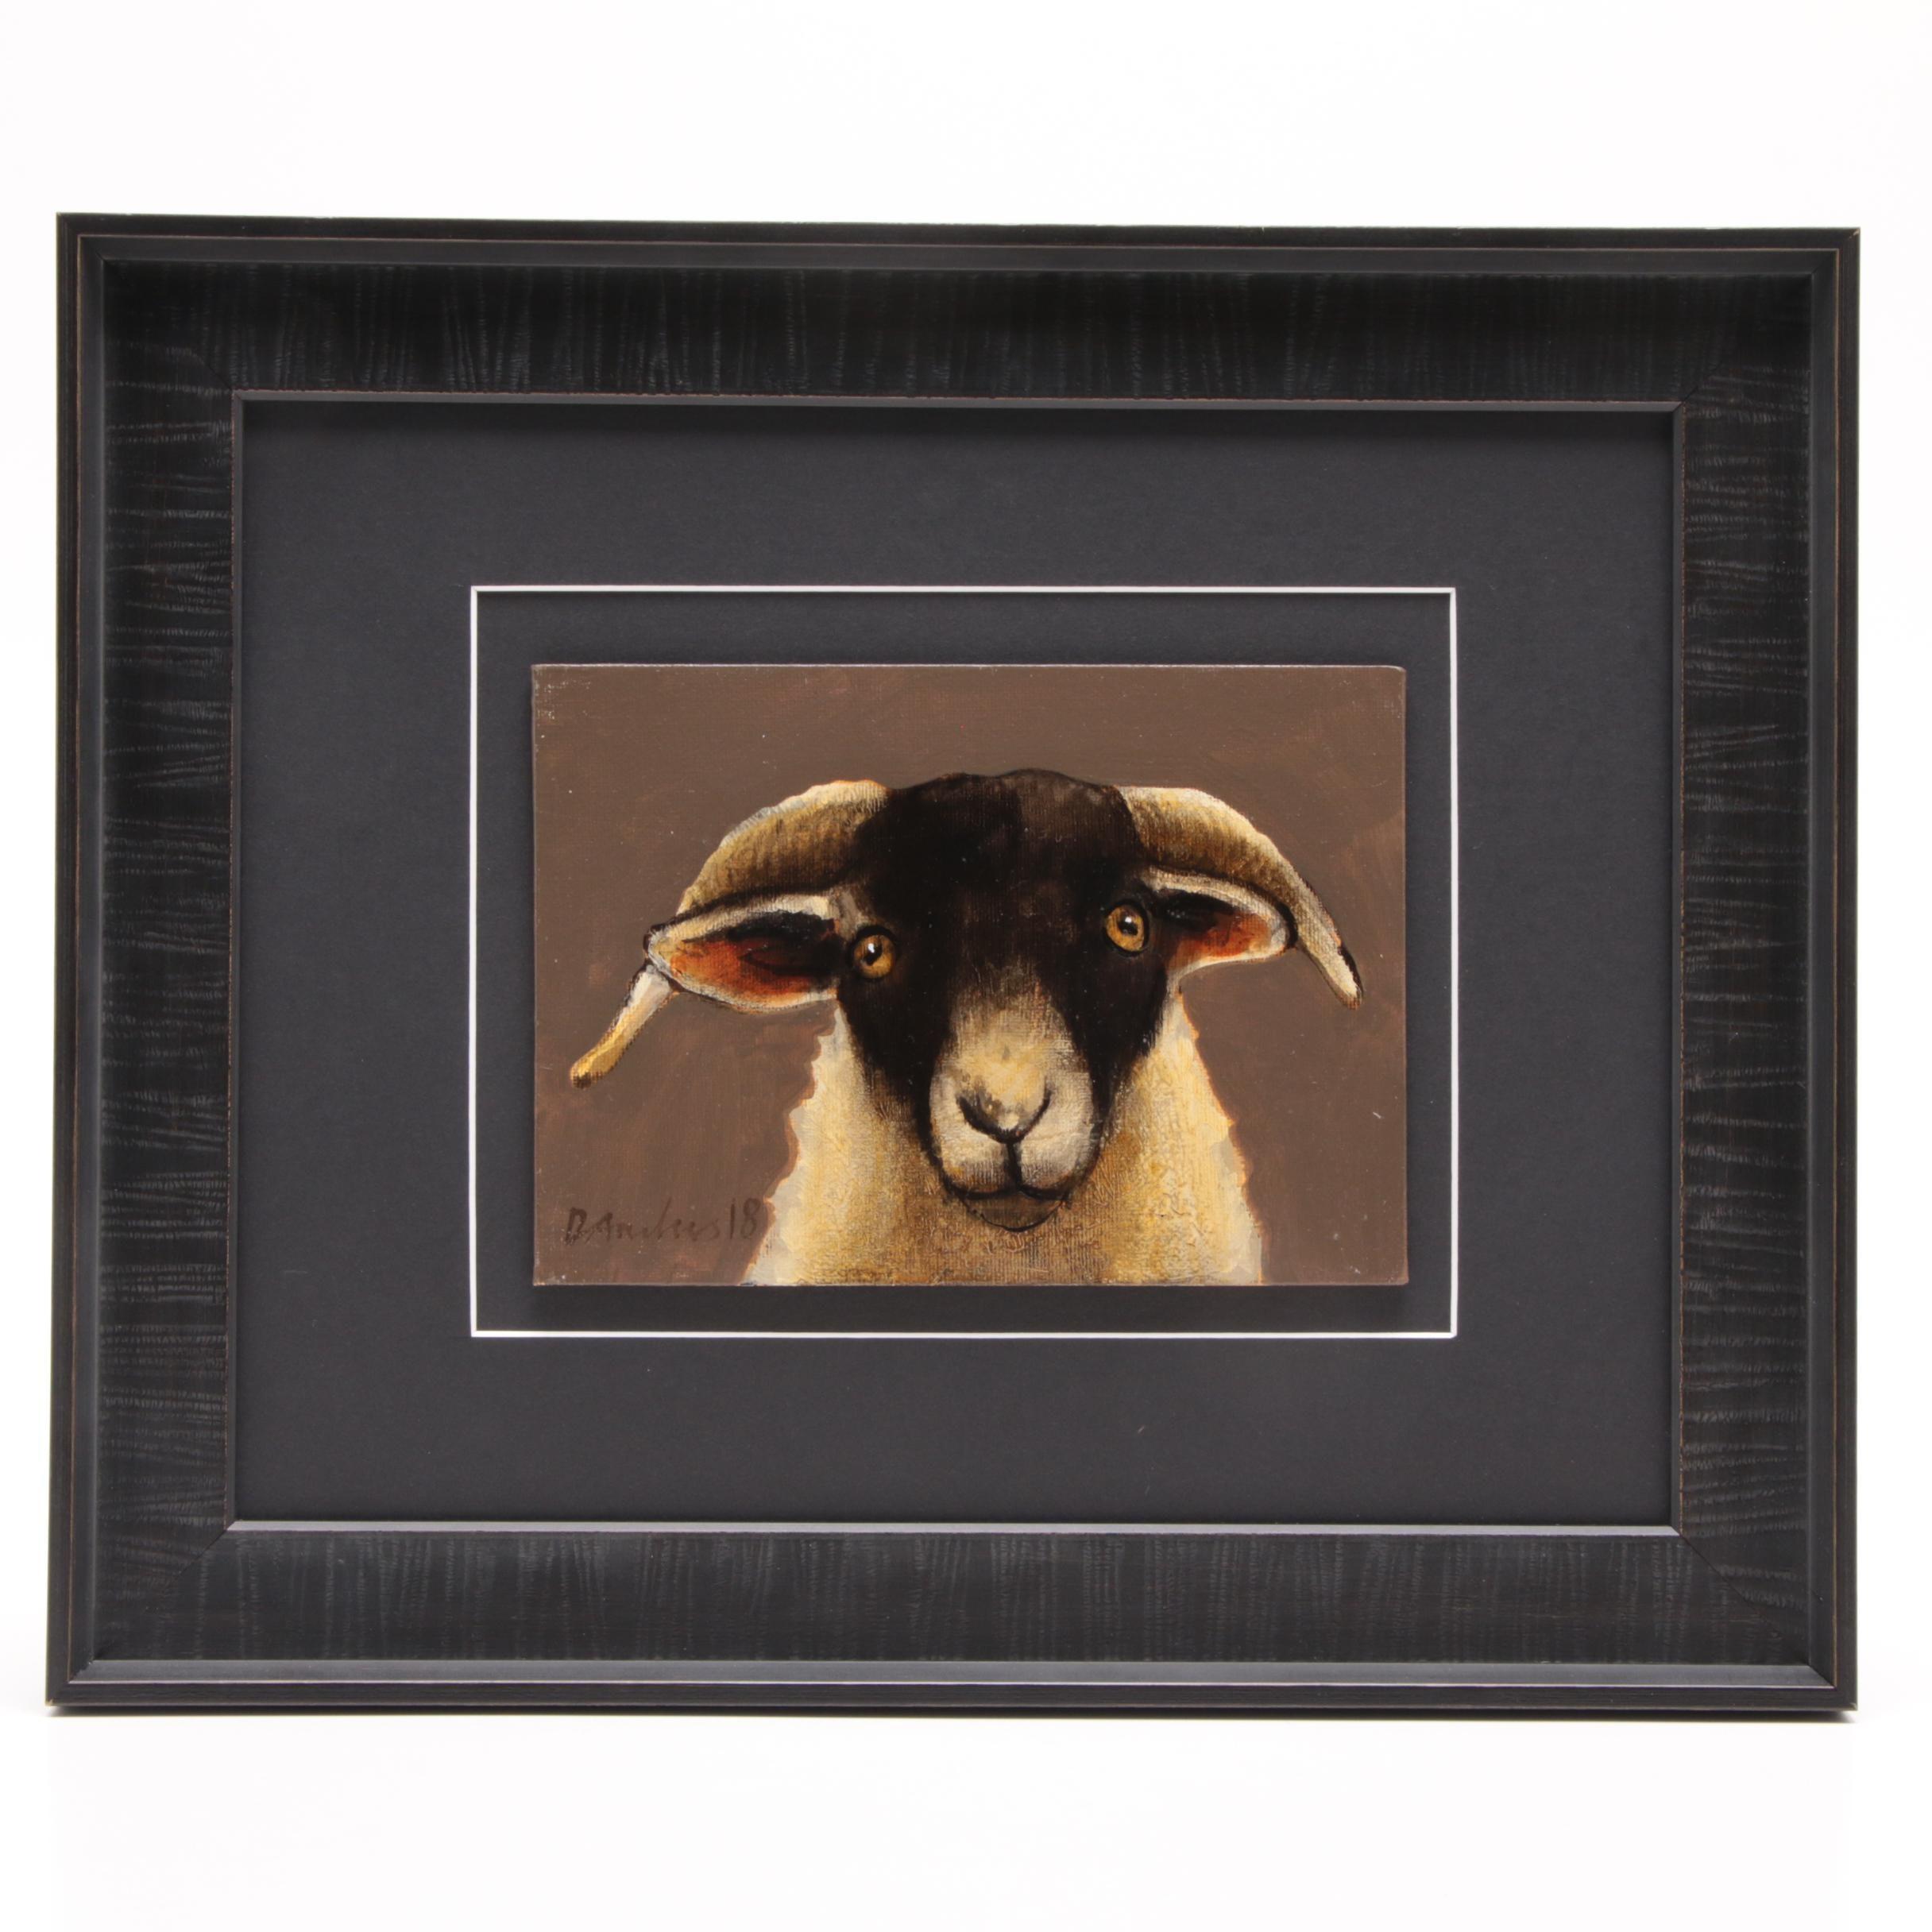 David Andrews Oil Painting of Scottish Blackface Sheep